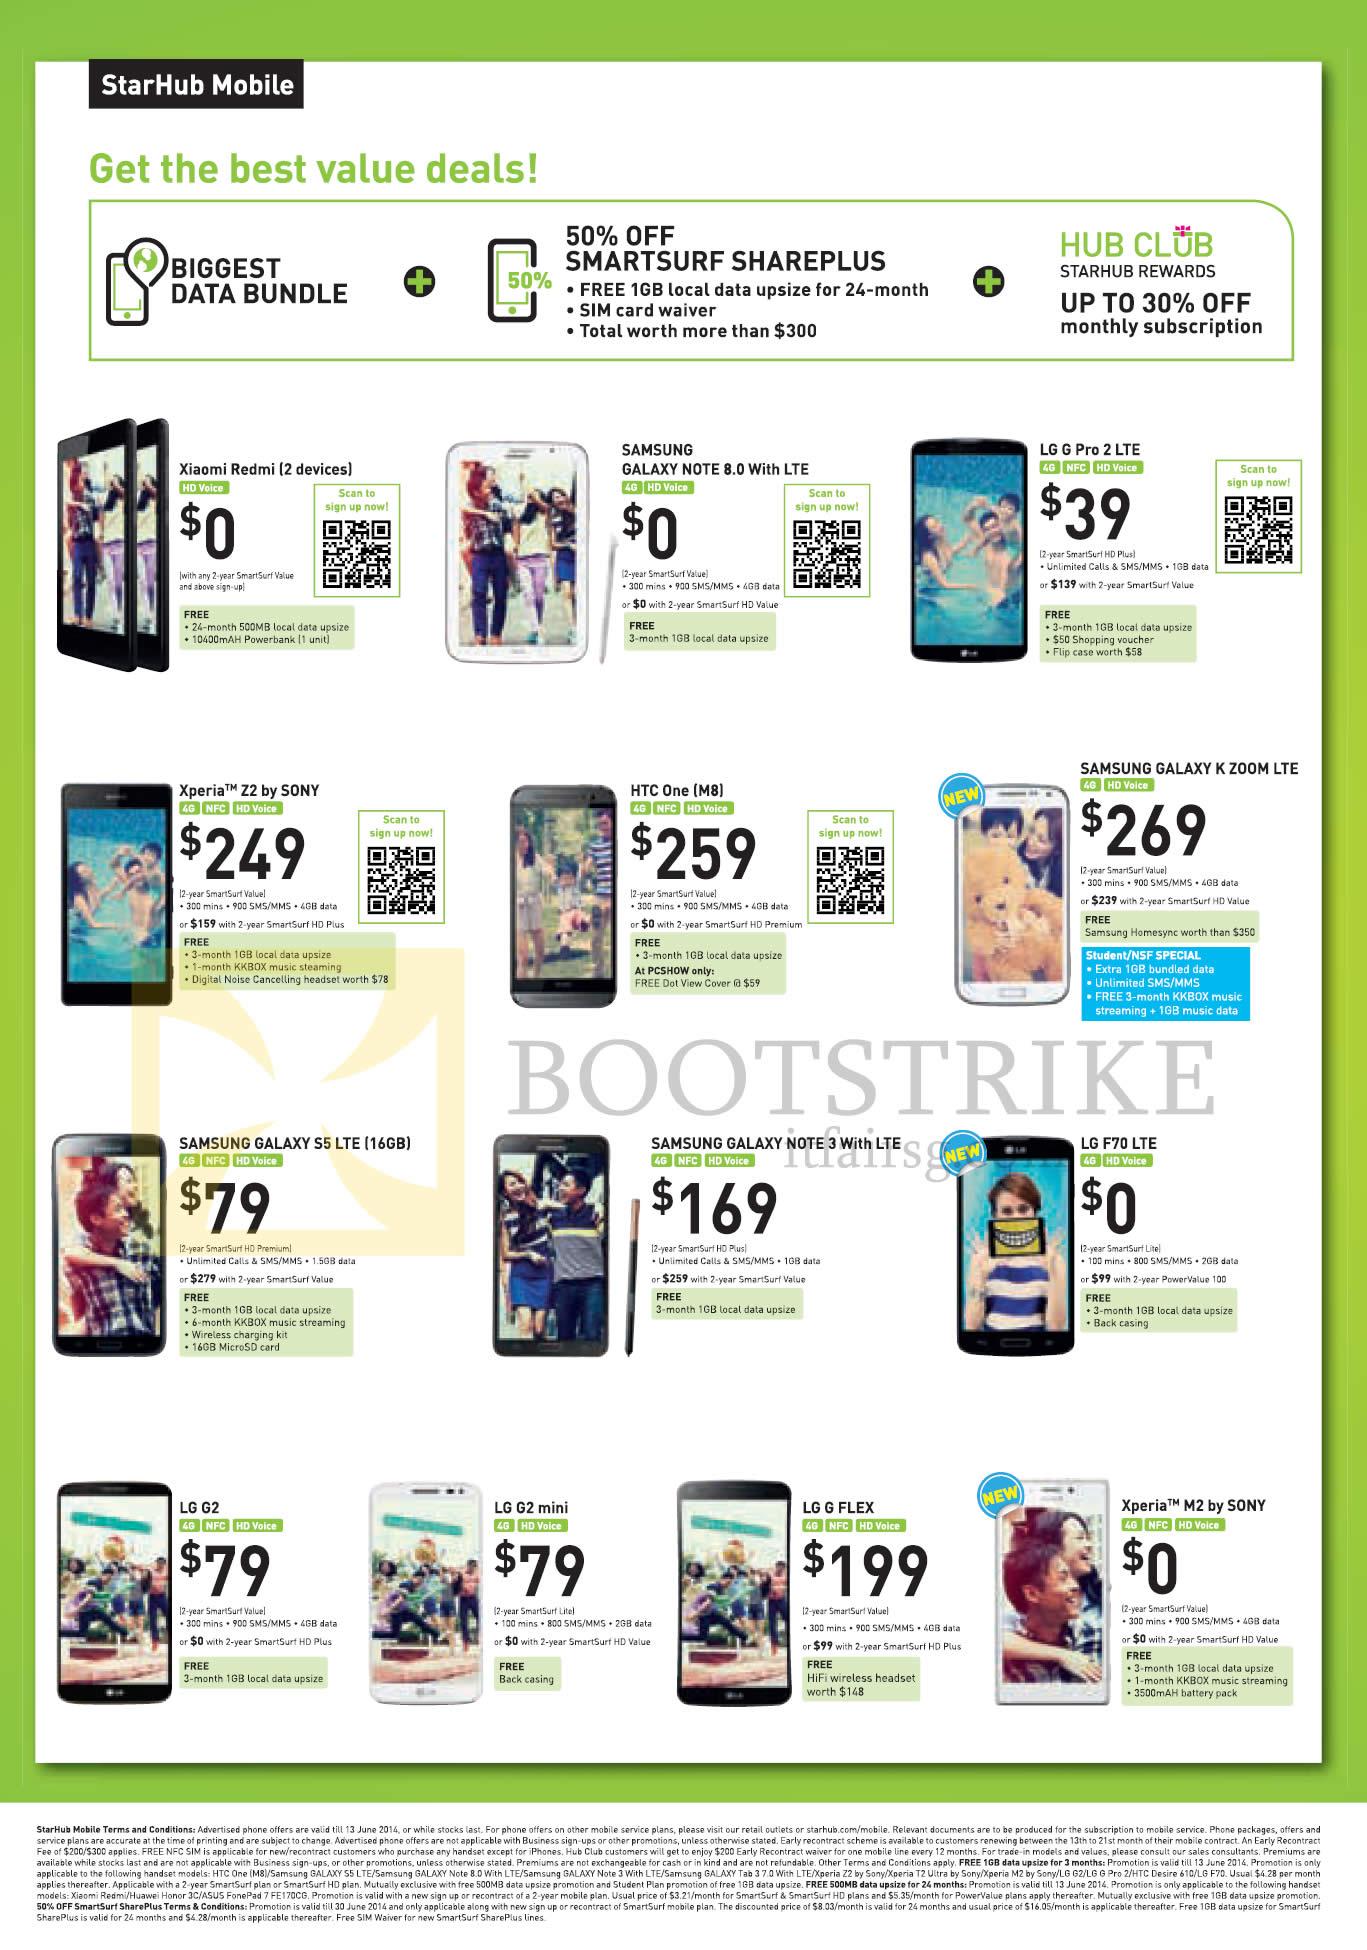 Starhub Mobile Xiaomi Redmi Samsung Galaxy Note 8 0 K